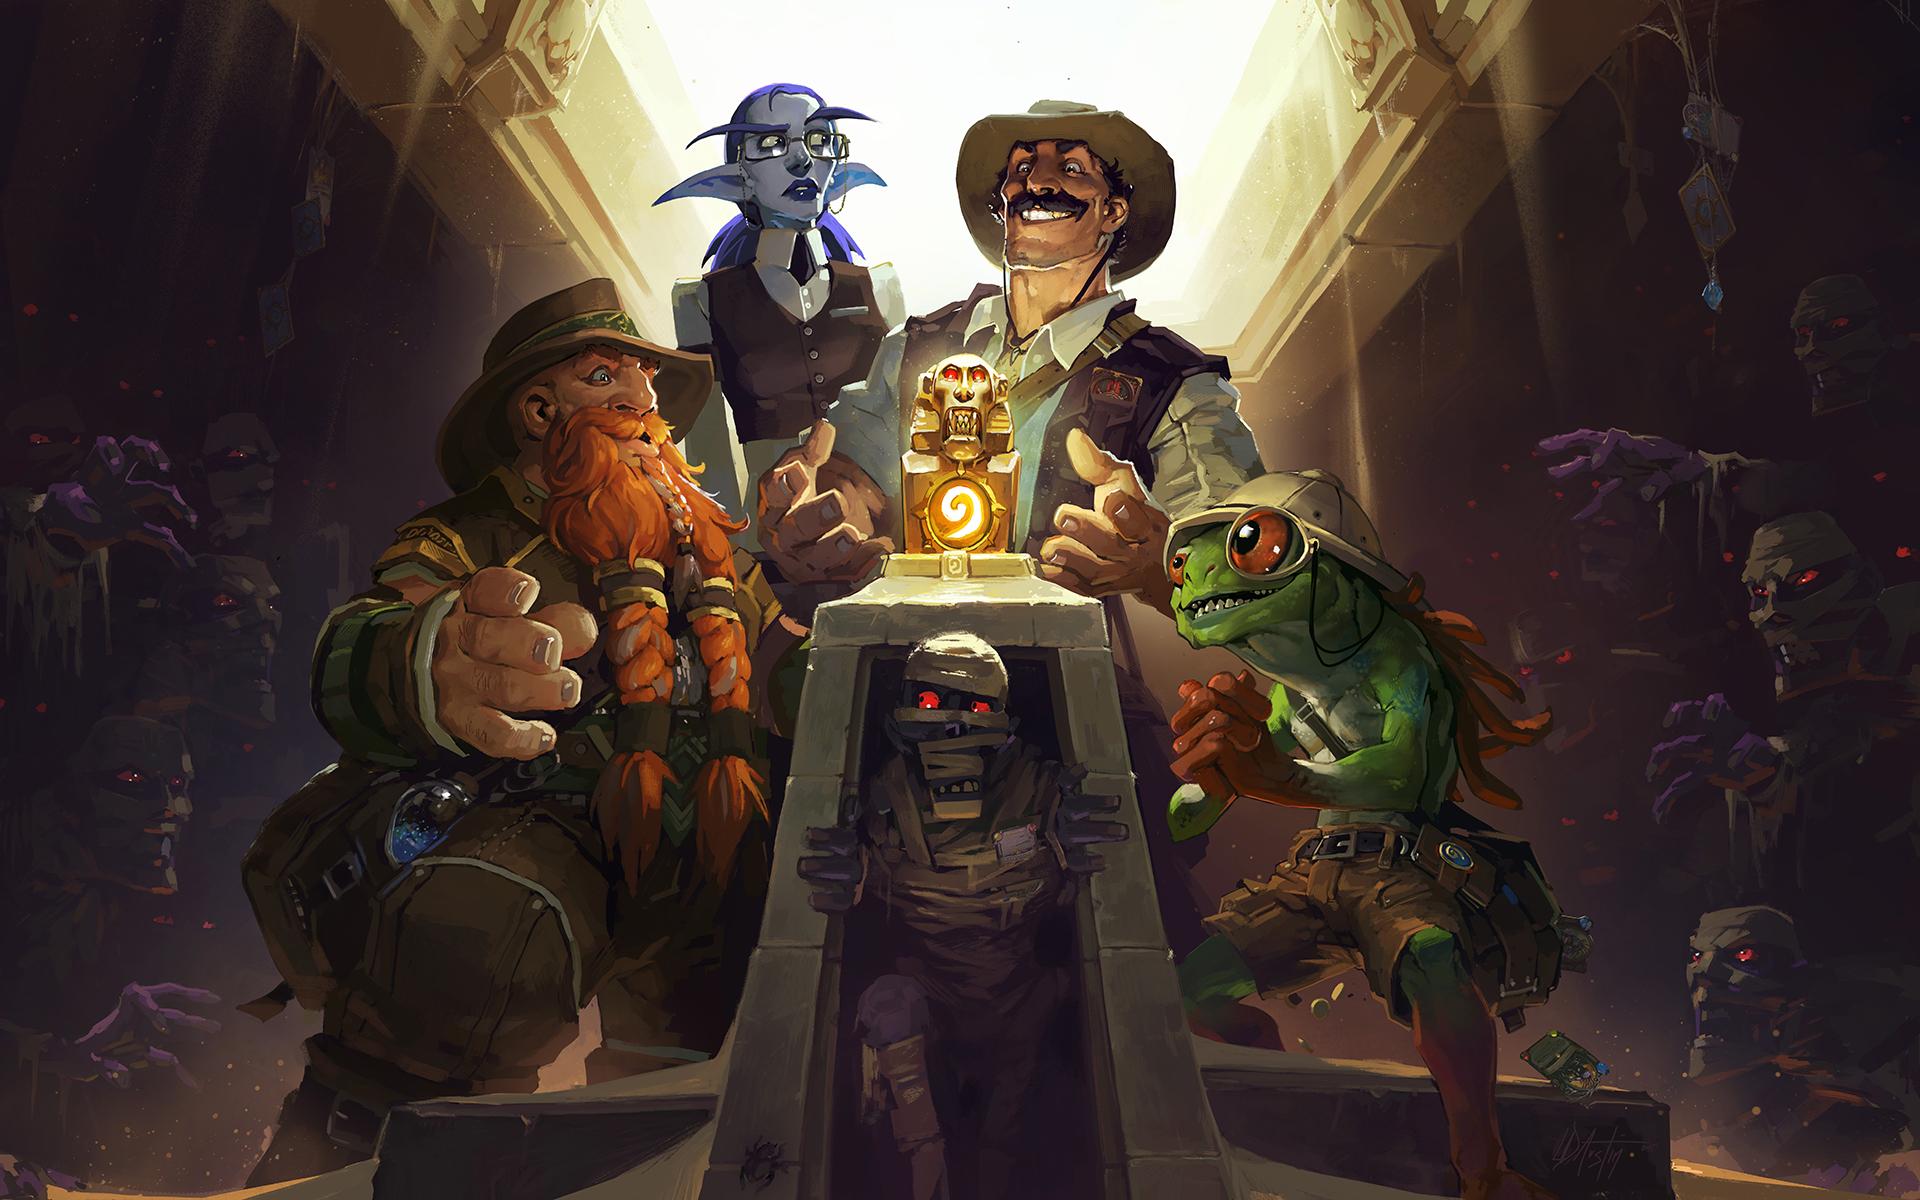 The League of Explorers Expansion